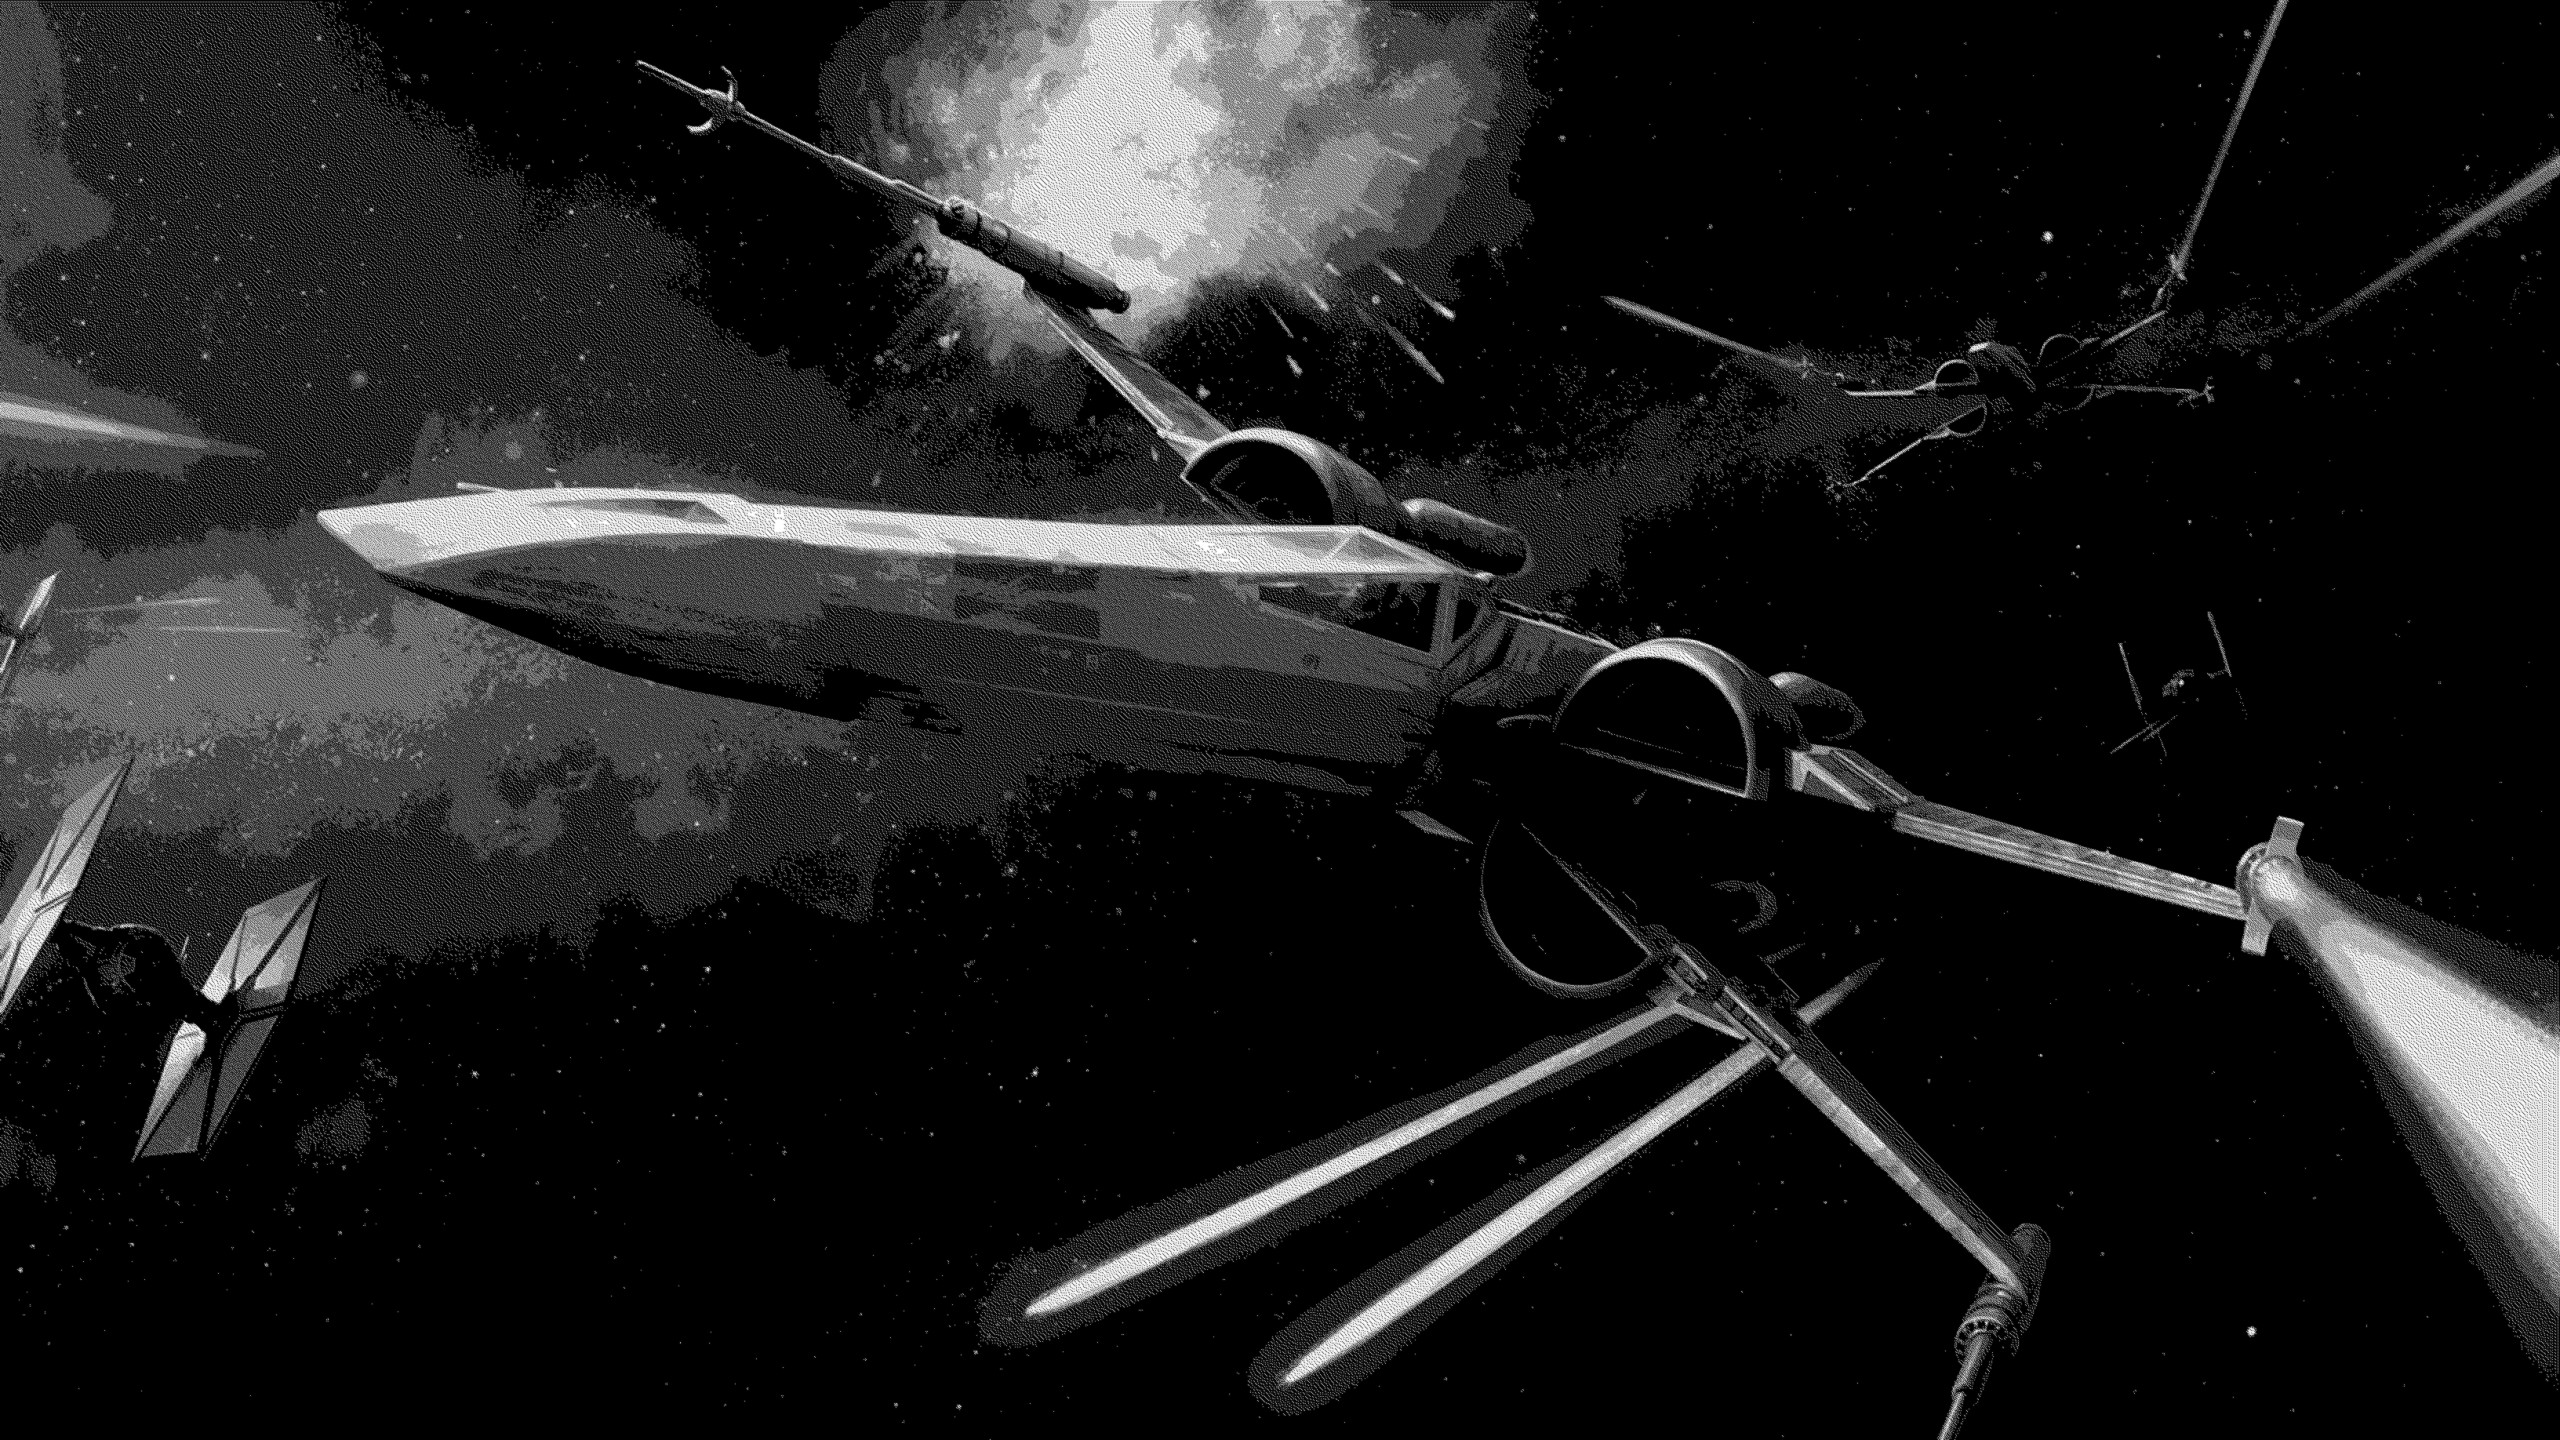 space, Spaceship, X wing, Star Wars